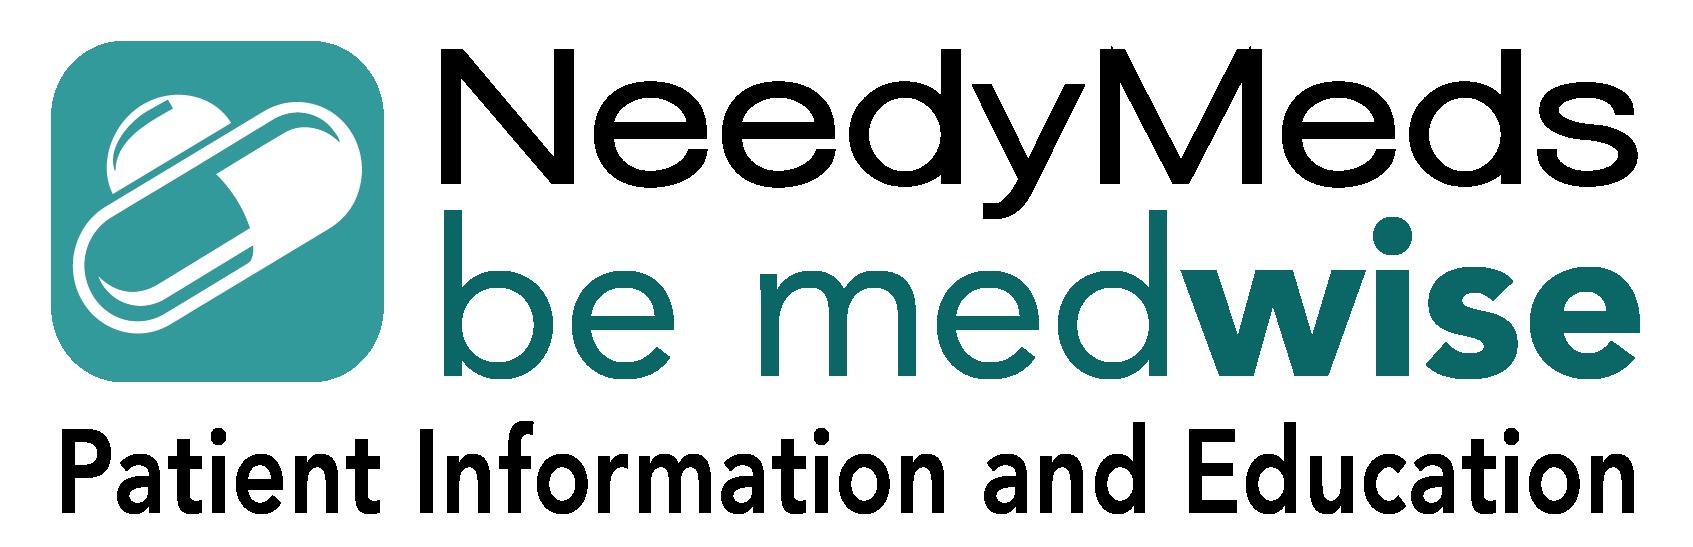 bemedwise - Best Prescription Discount Card Reviews